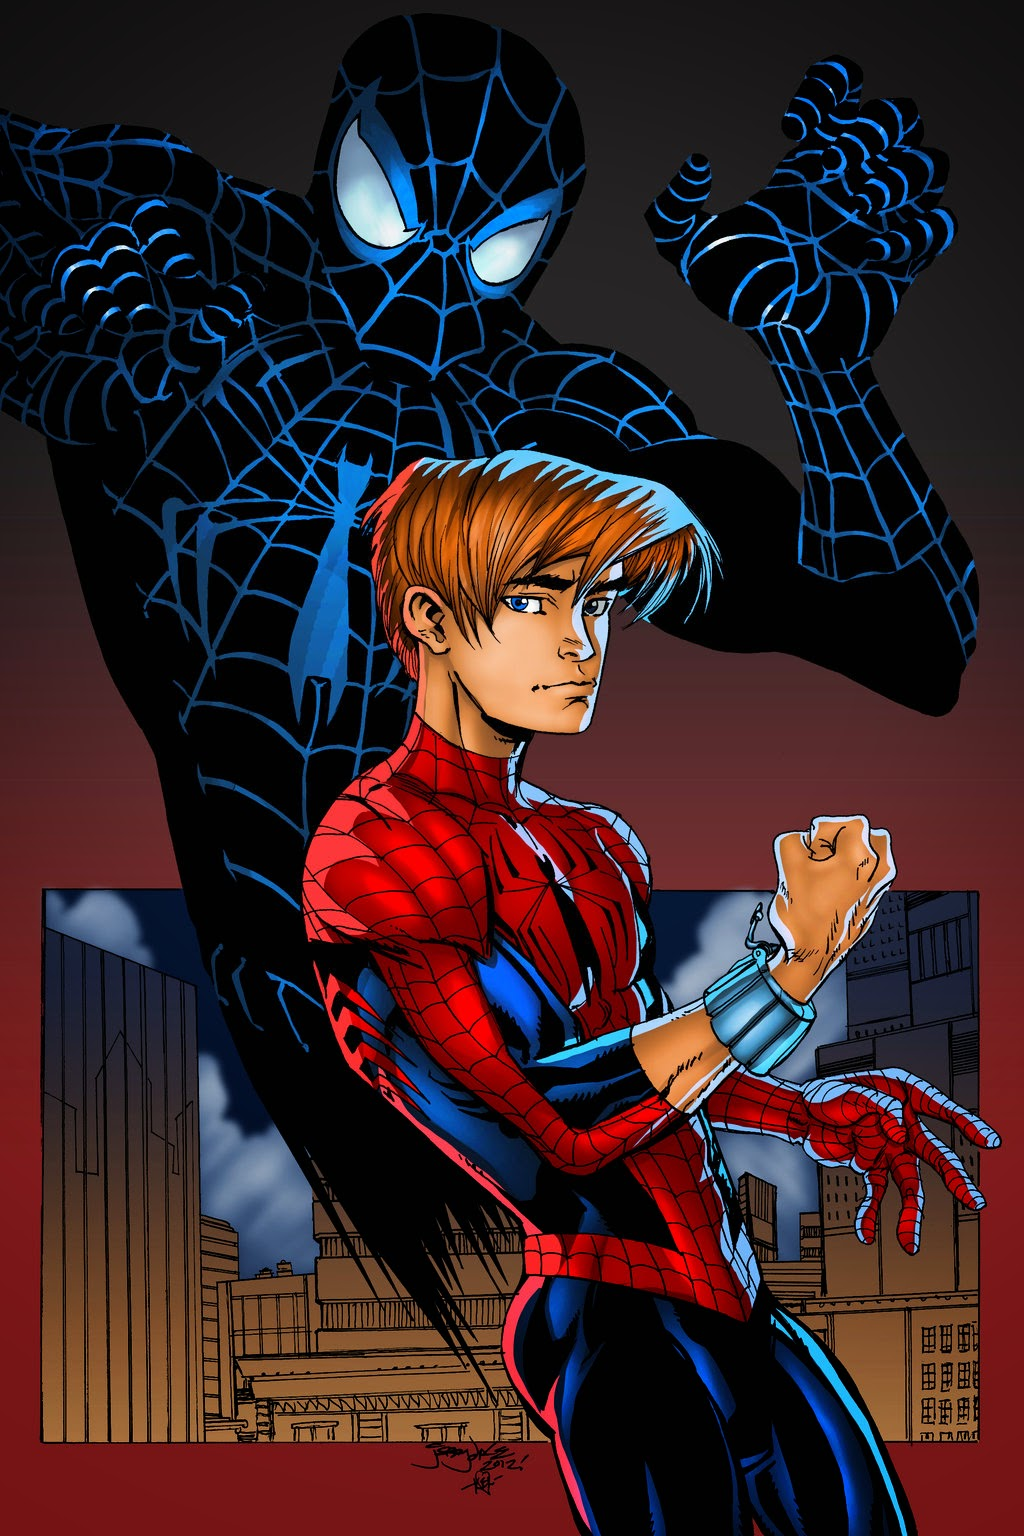 Kumpulan Gambar Ultimate Spider Man Gambar Lucu Terbaru